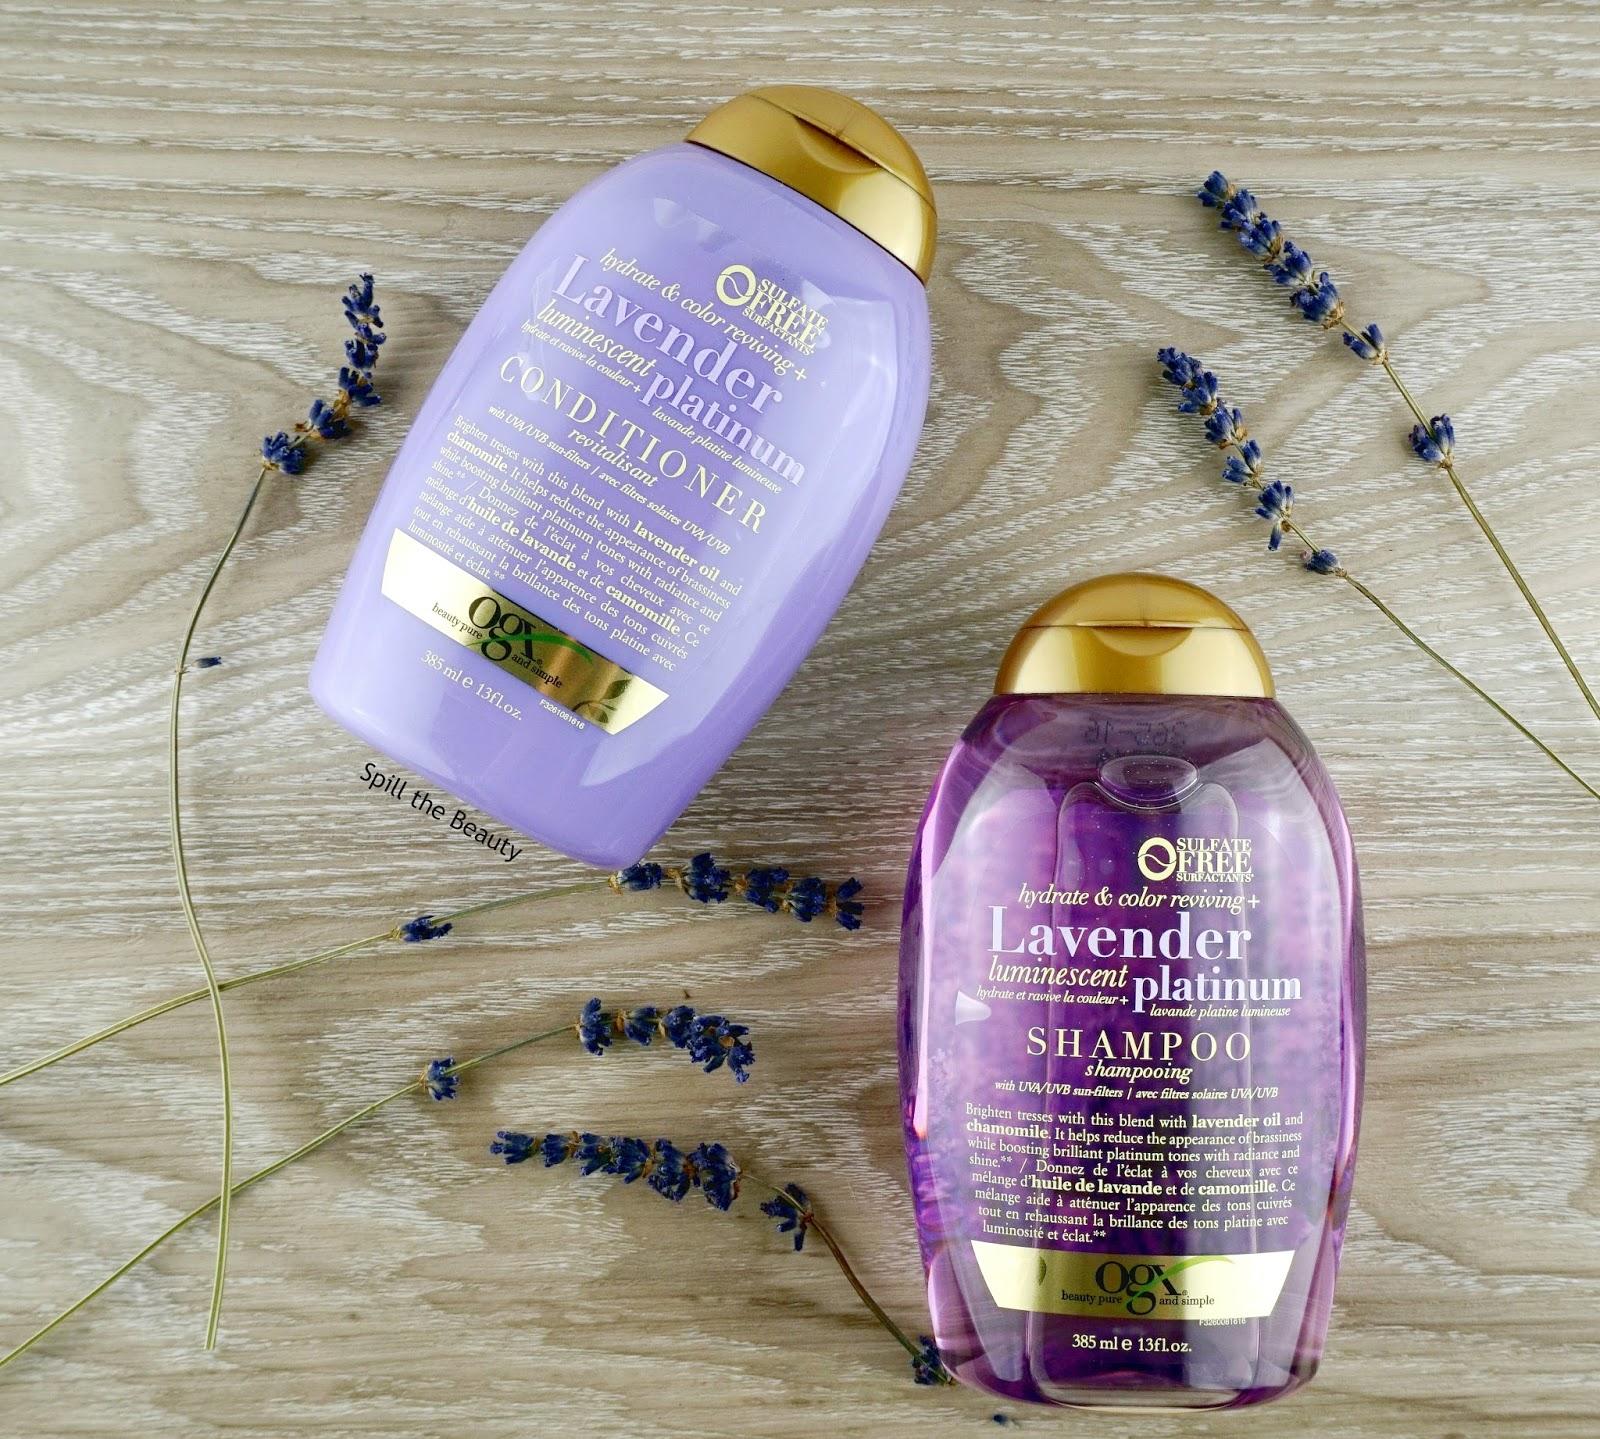 OGX Lavender Luminescent Platinum Shampoo & Conditioner - Review